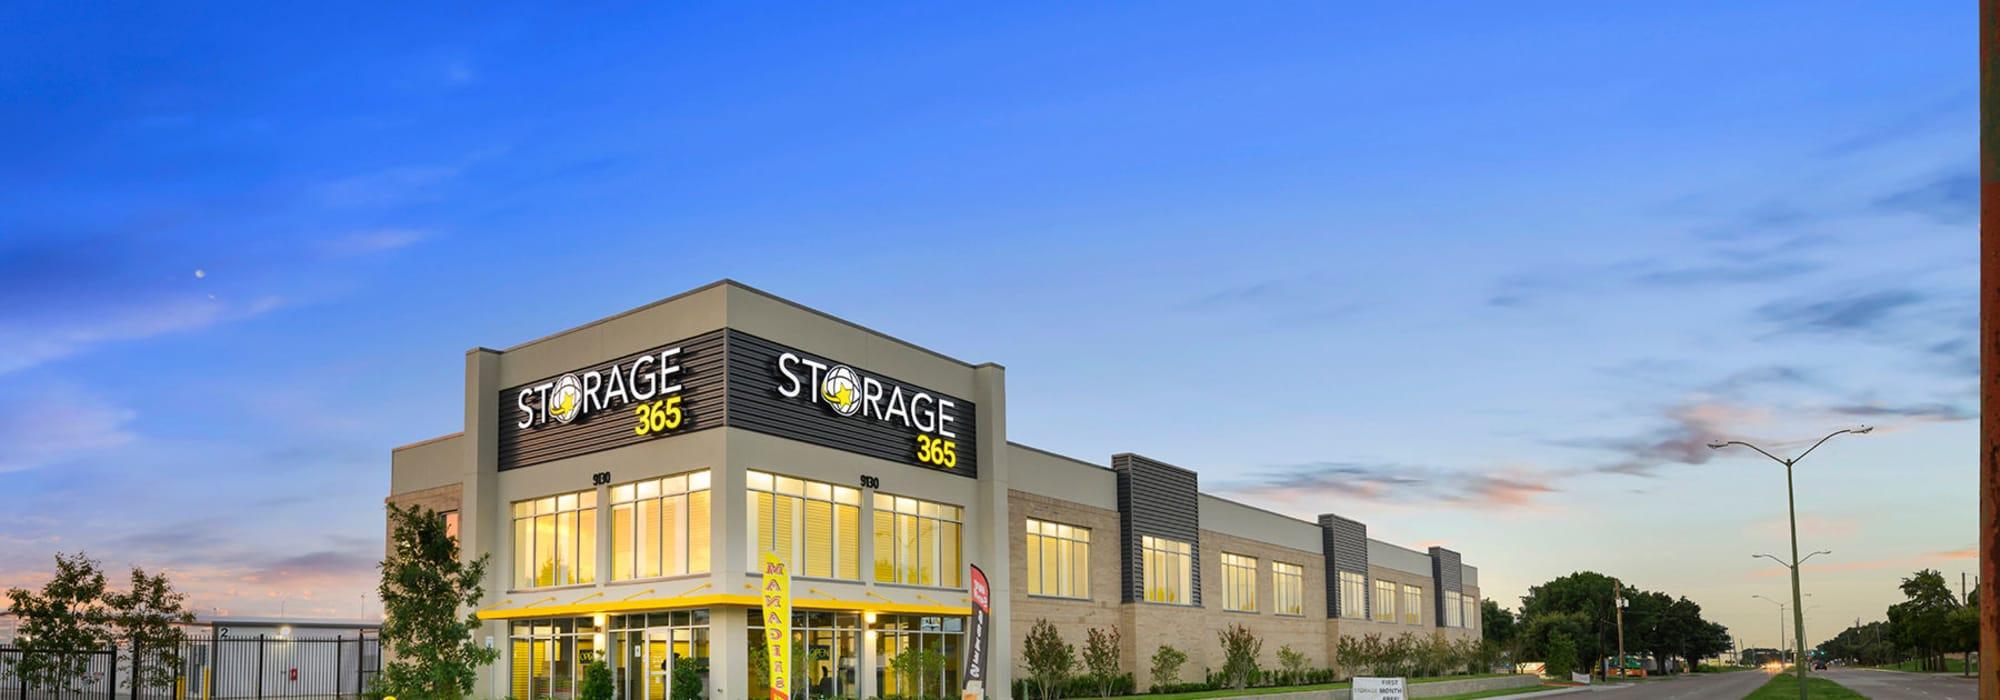 Storage 365 self storage in Dallas, Texas